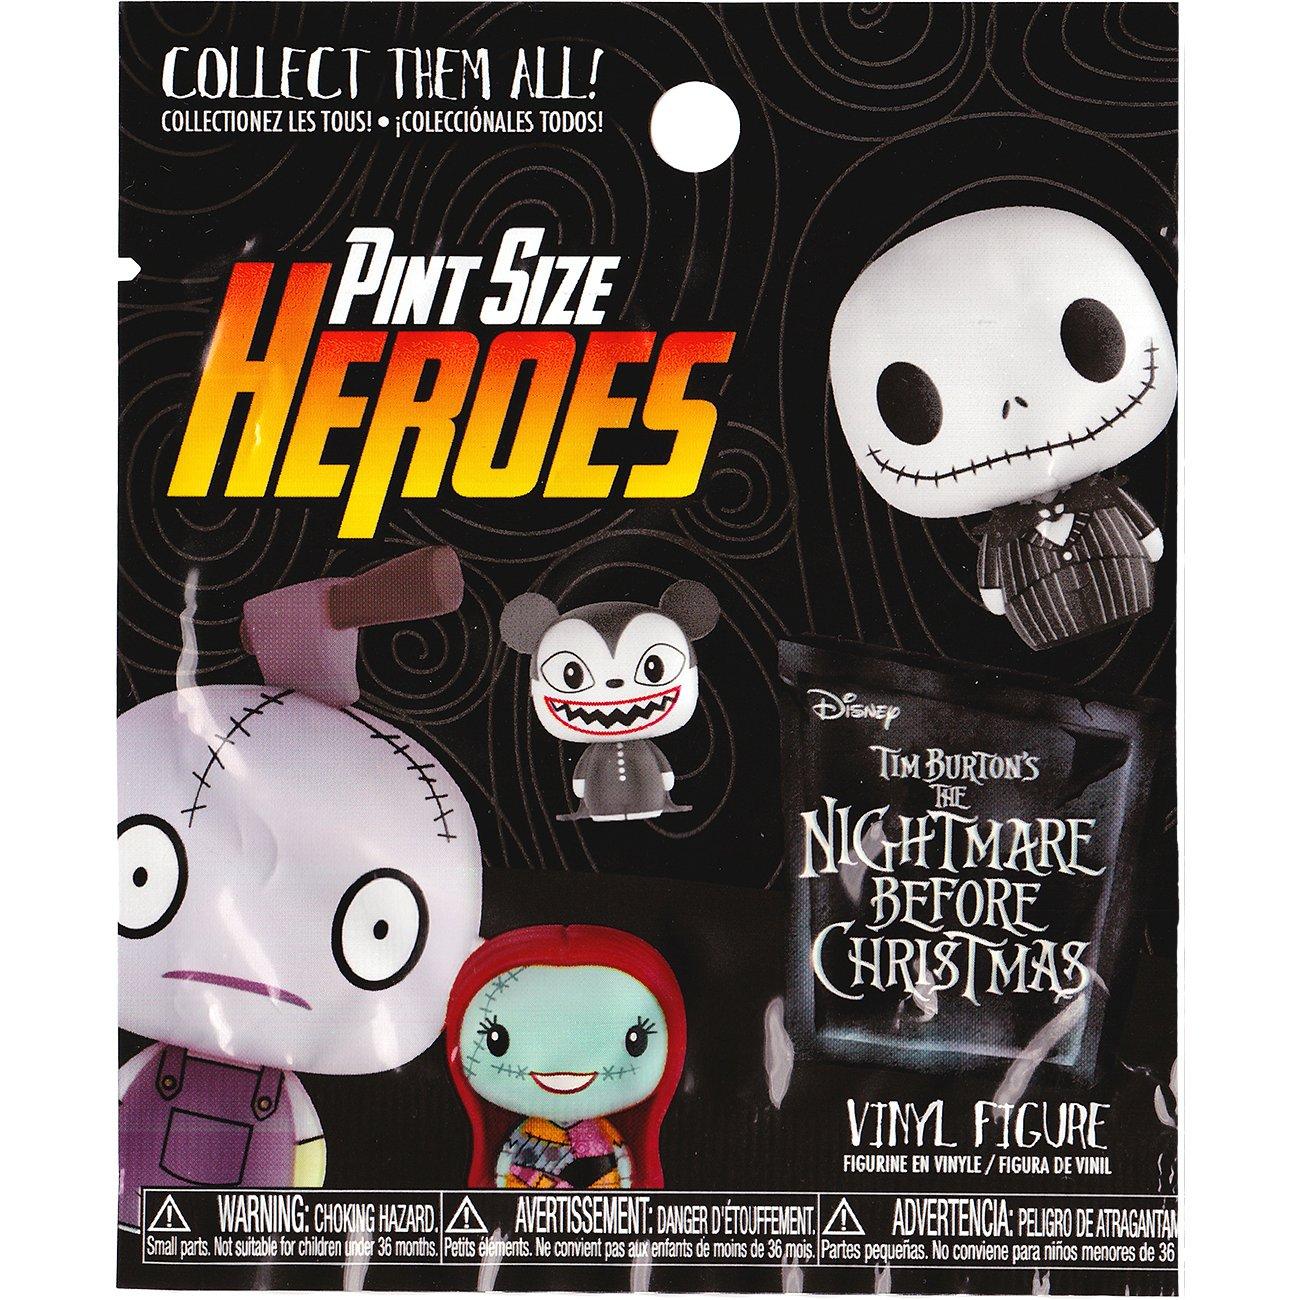 Funko Pint Size Heroes x The Nightmares Before Christmas Micro Vinyl Figure 15049 Vampire Teddy